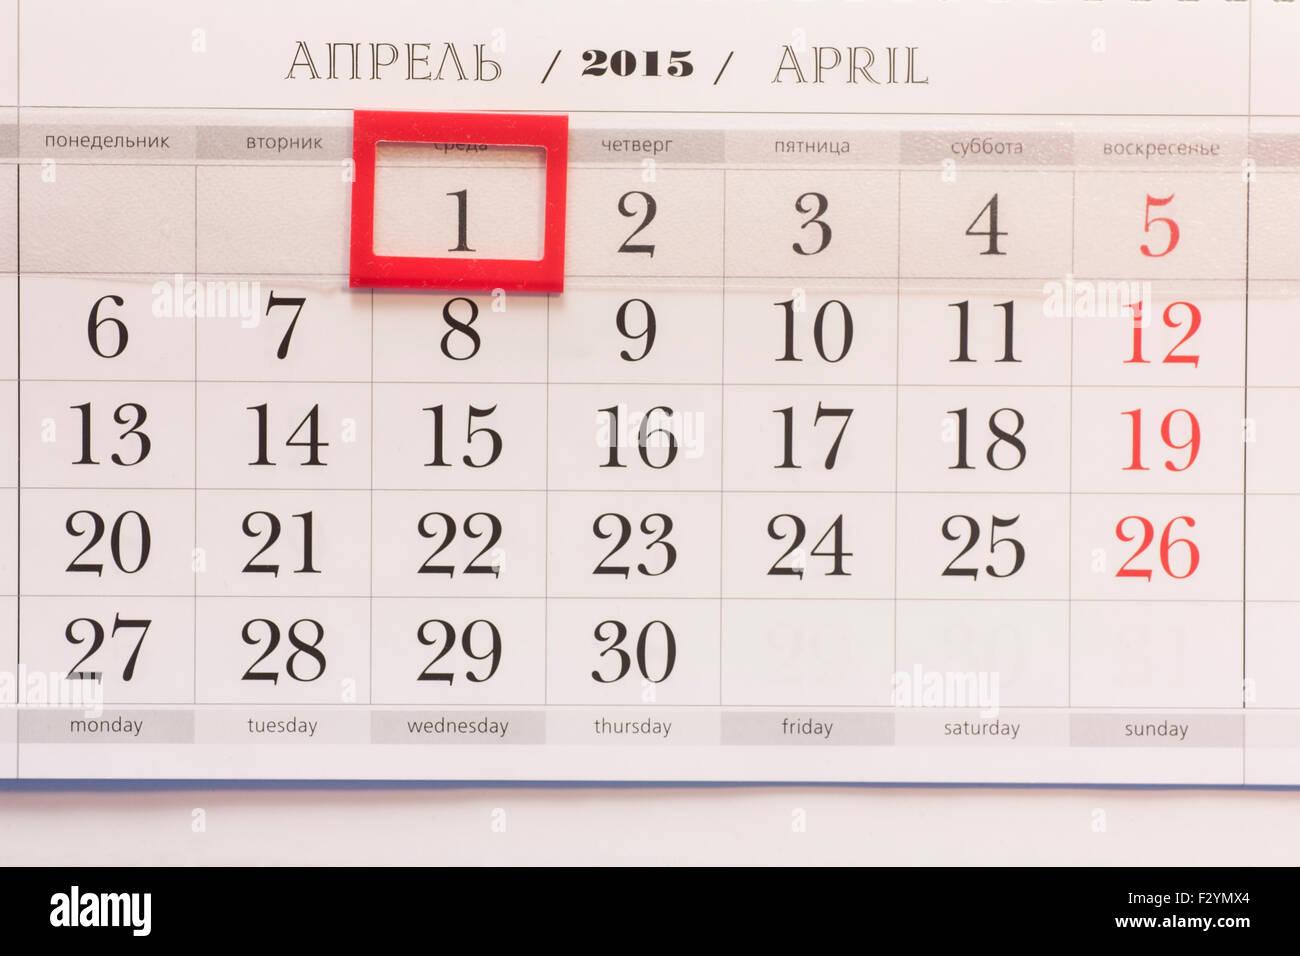 2015 year calendar april calendar with red mark on framed date 1